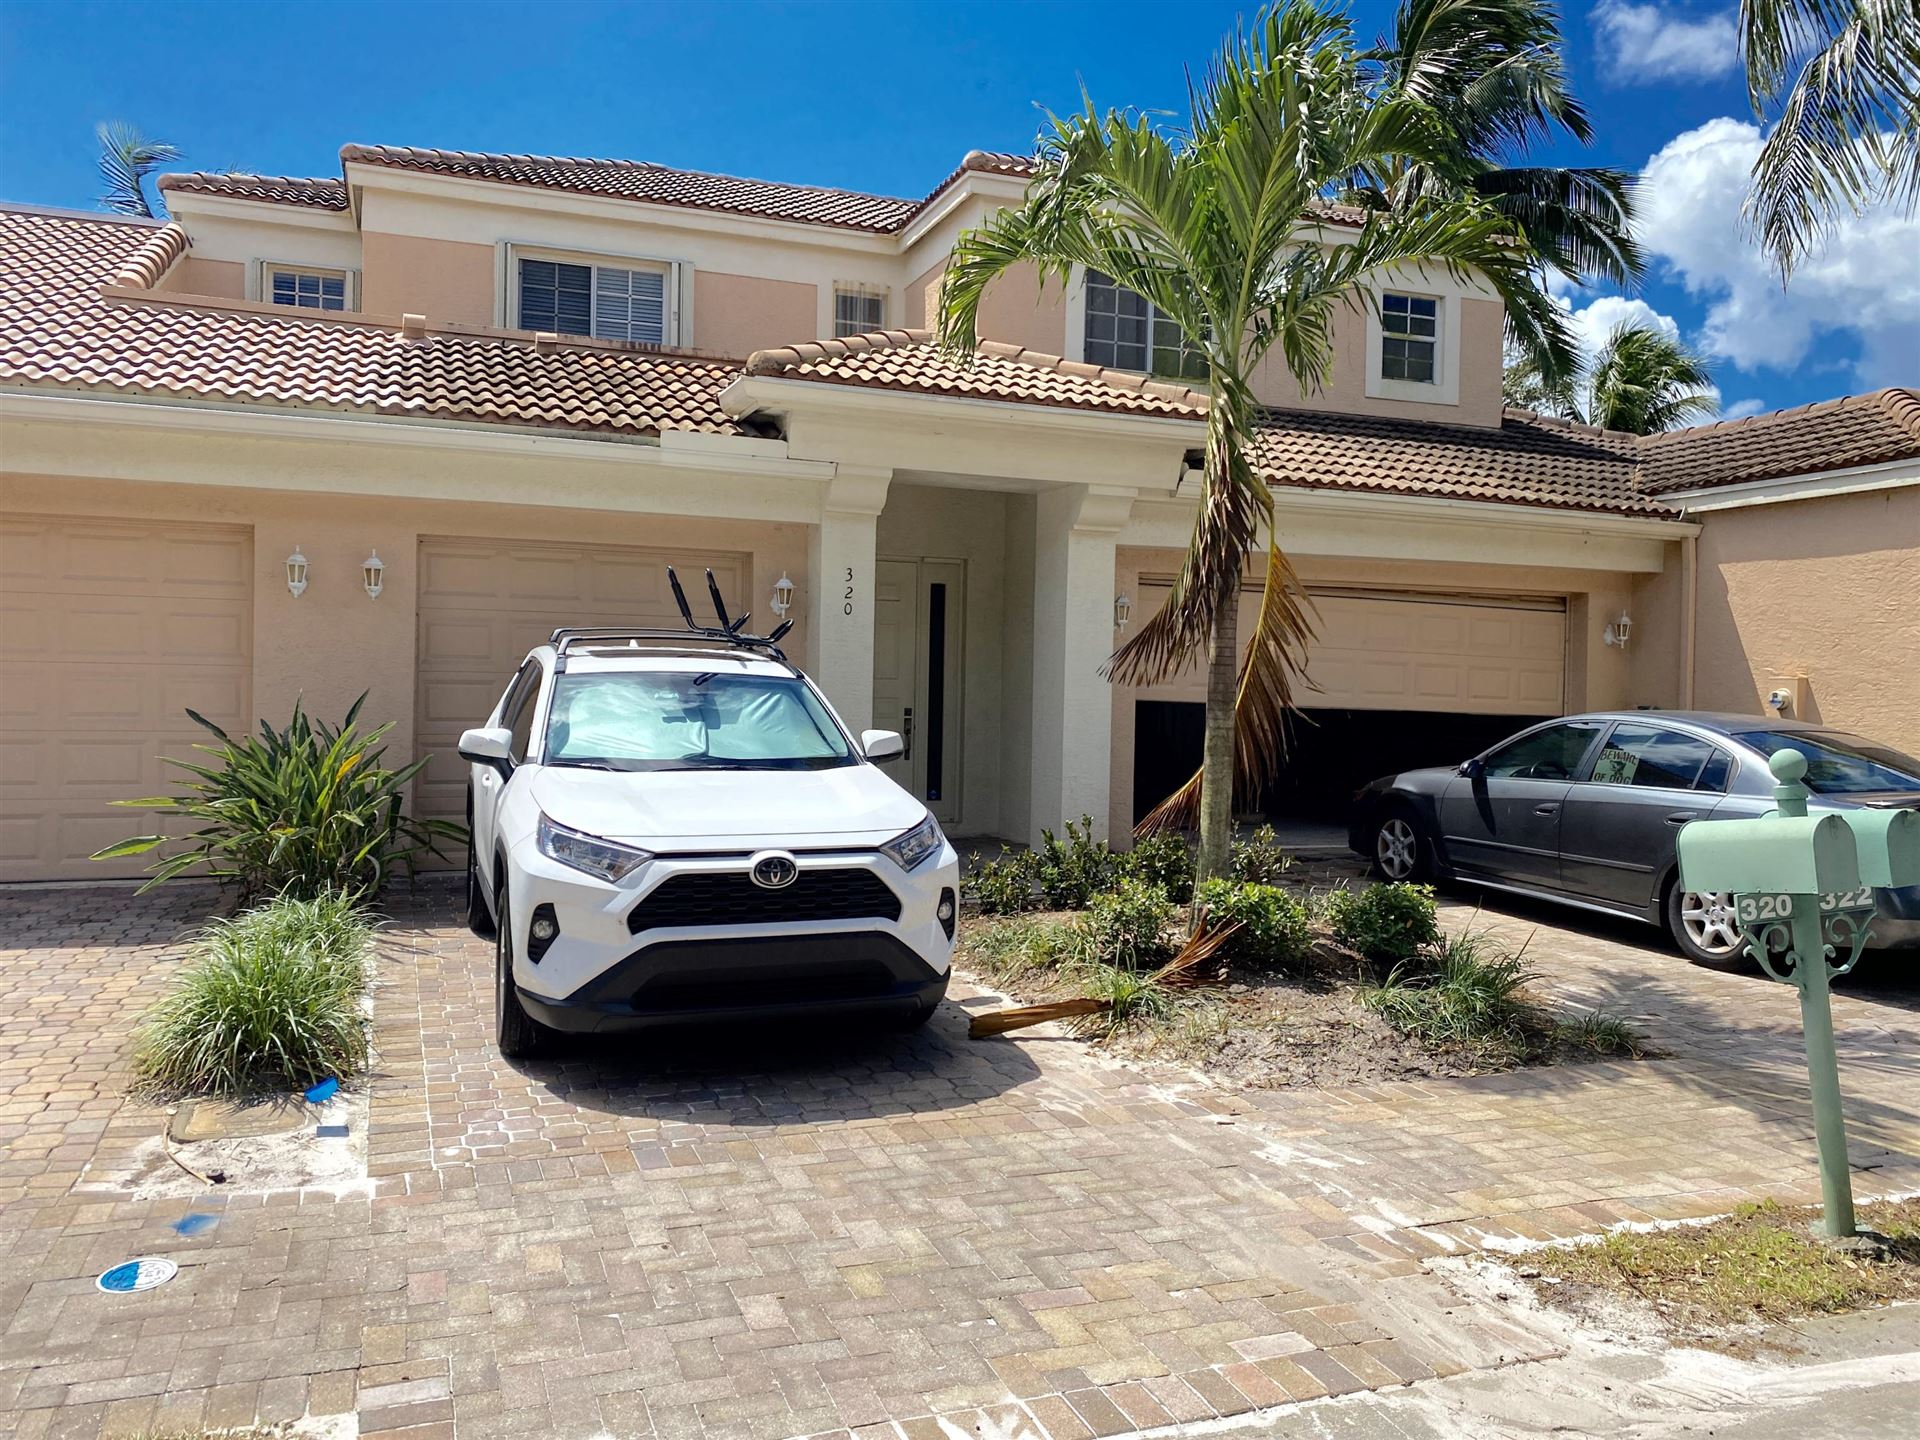 Photo of 320 Commons Way, Palm Beach Gardens, FL 33418 (MLS # RX-10661562)